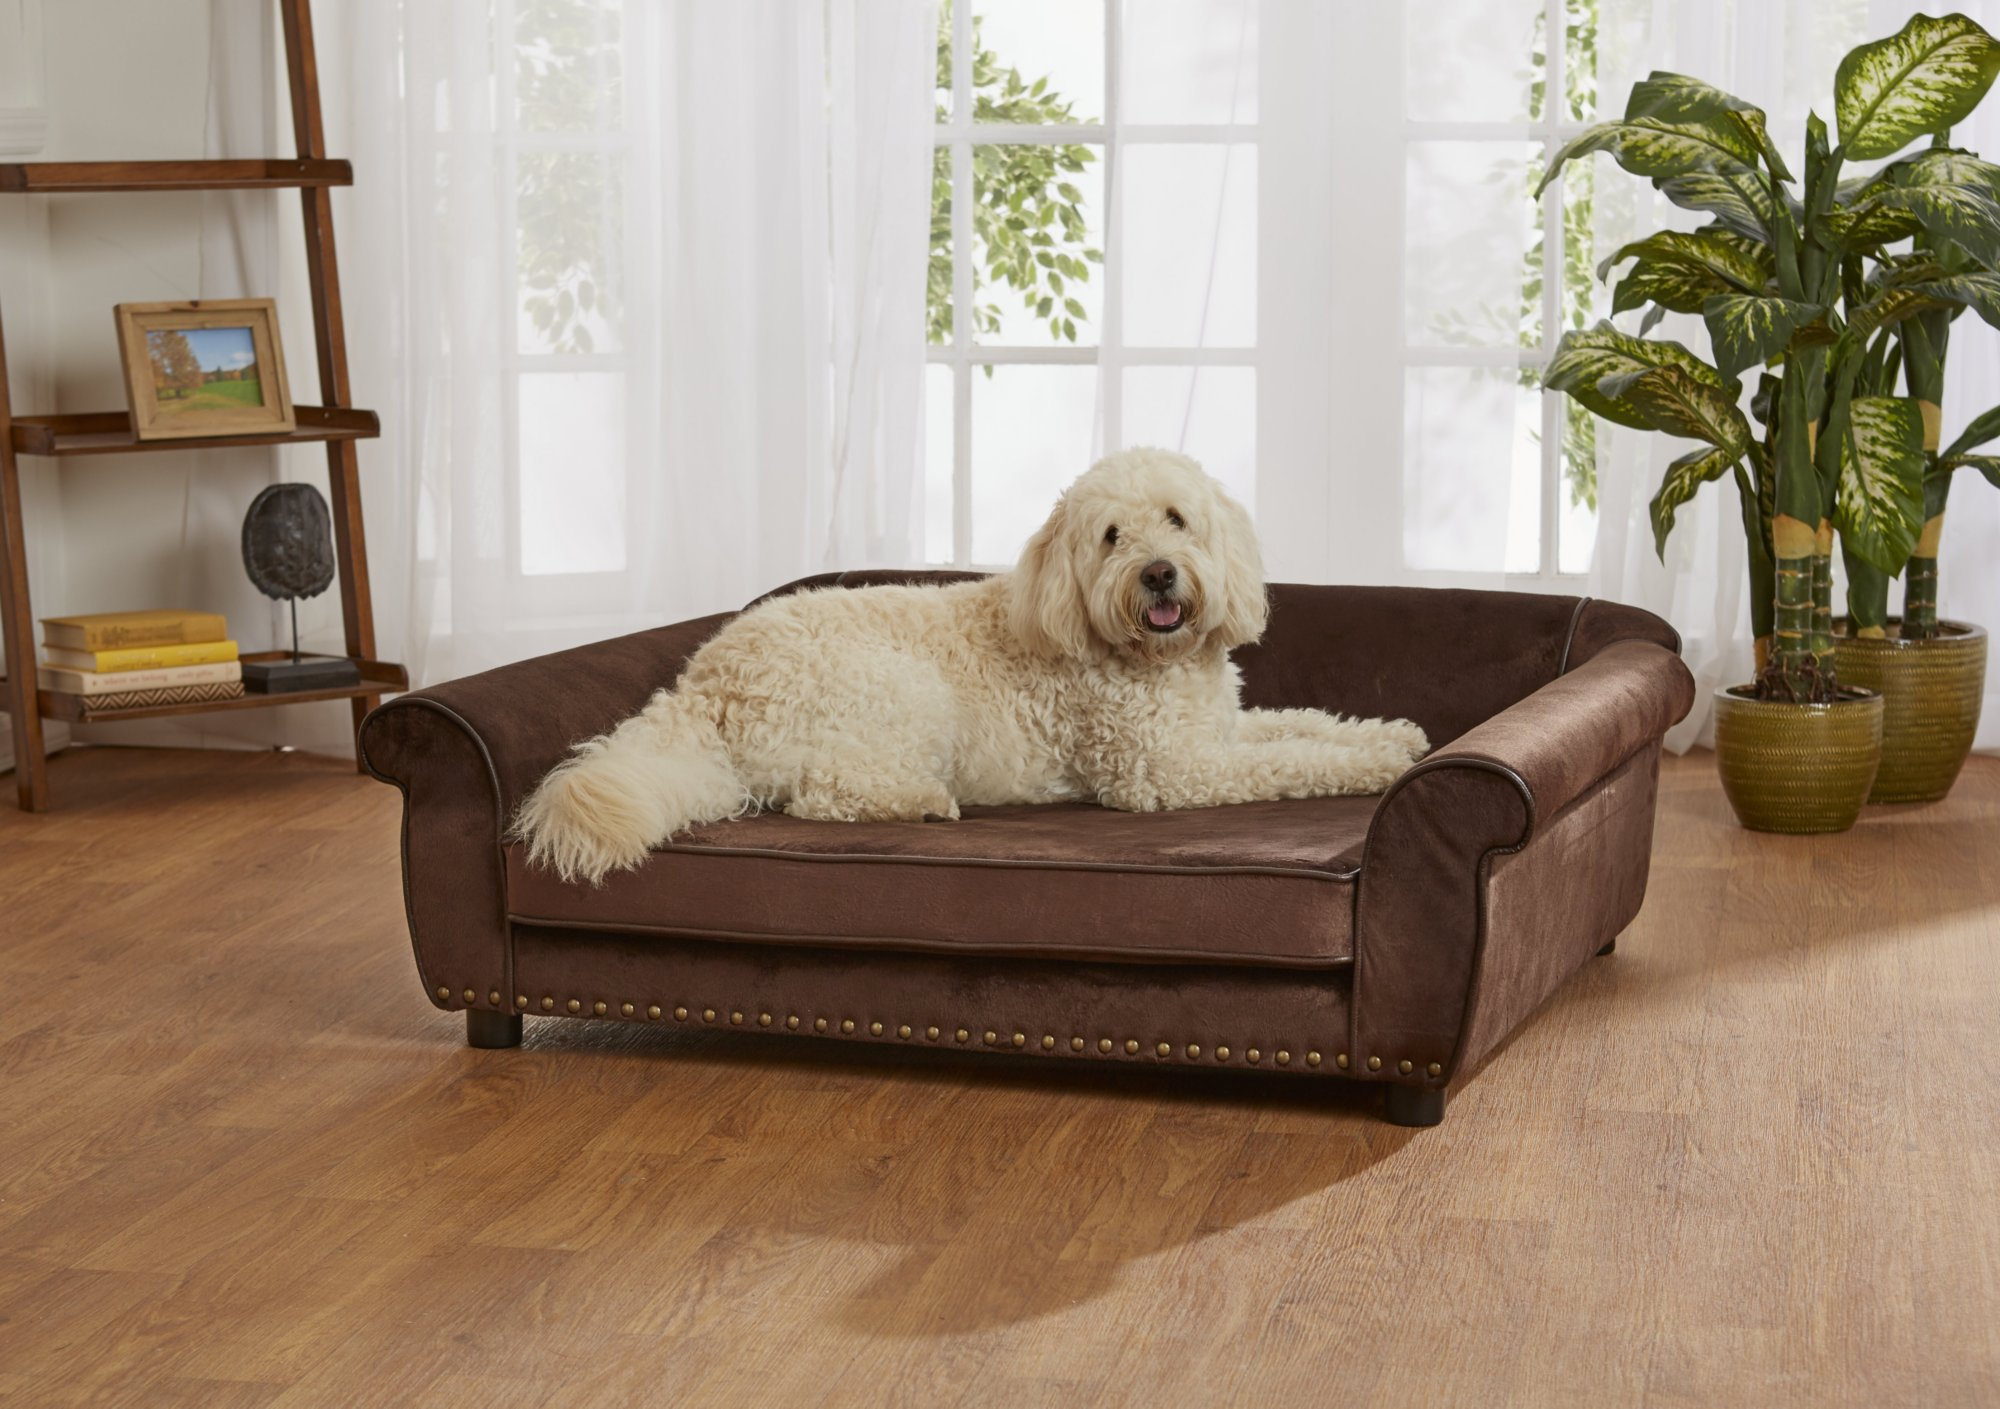 enchanted home mackenzie pet sofa pads uk brown ultra plush outlaw petco